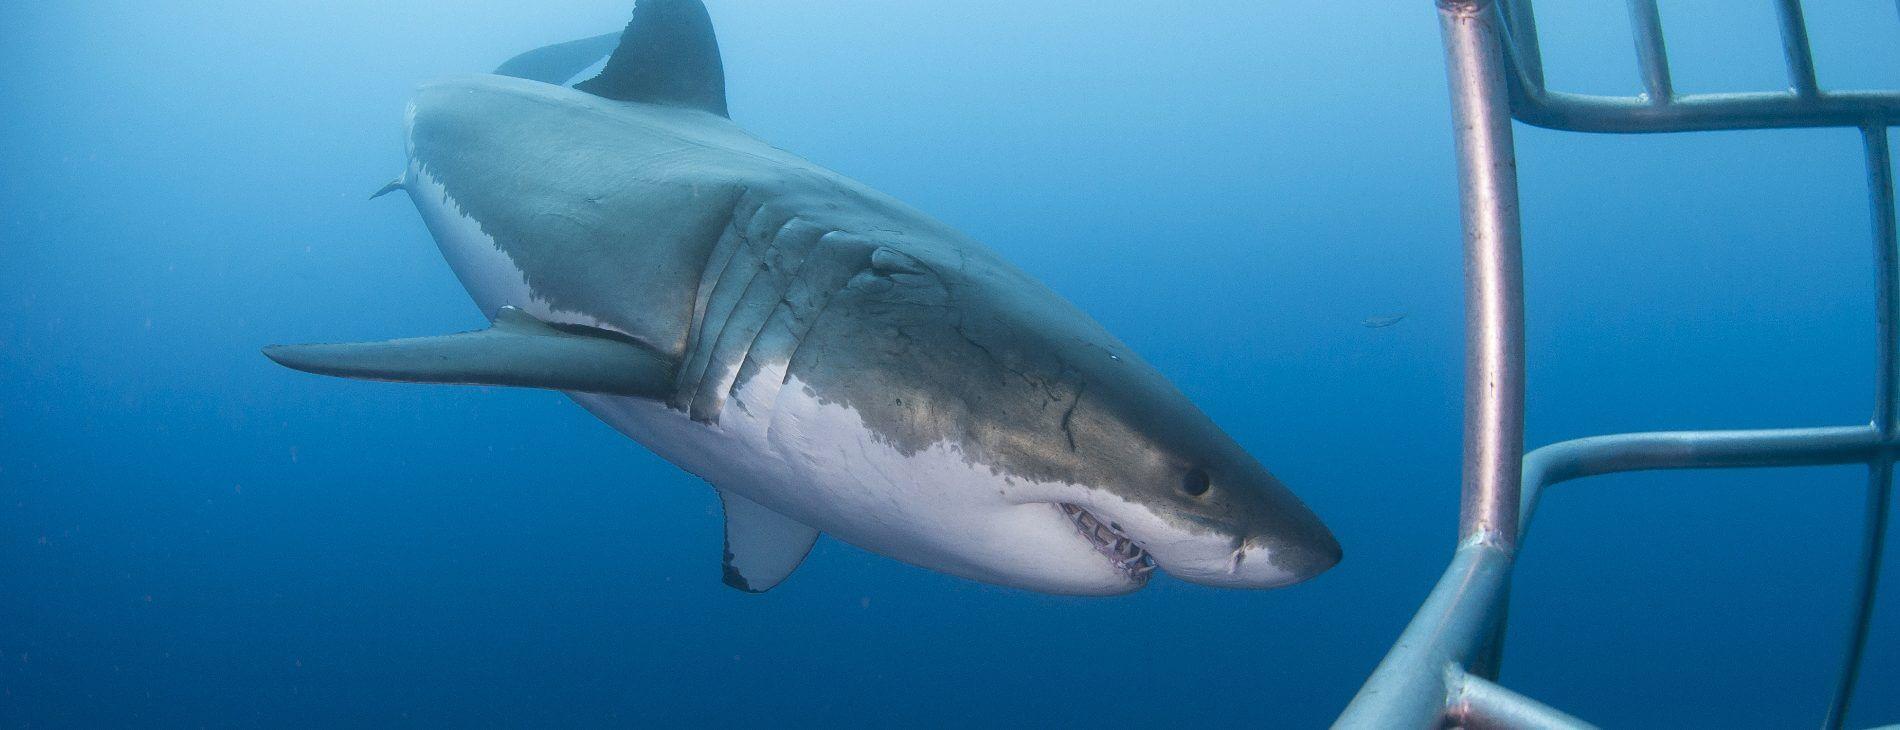 Mastroviaggiatore Sudafrica - Sharkaholic - White Shark Cage